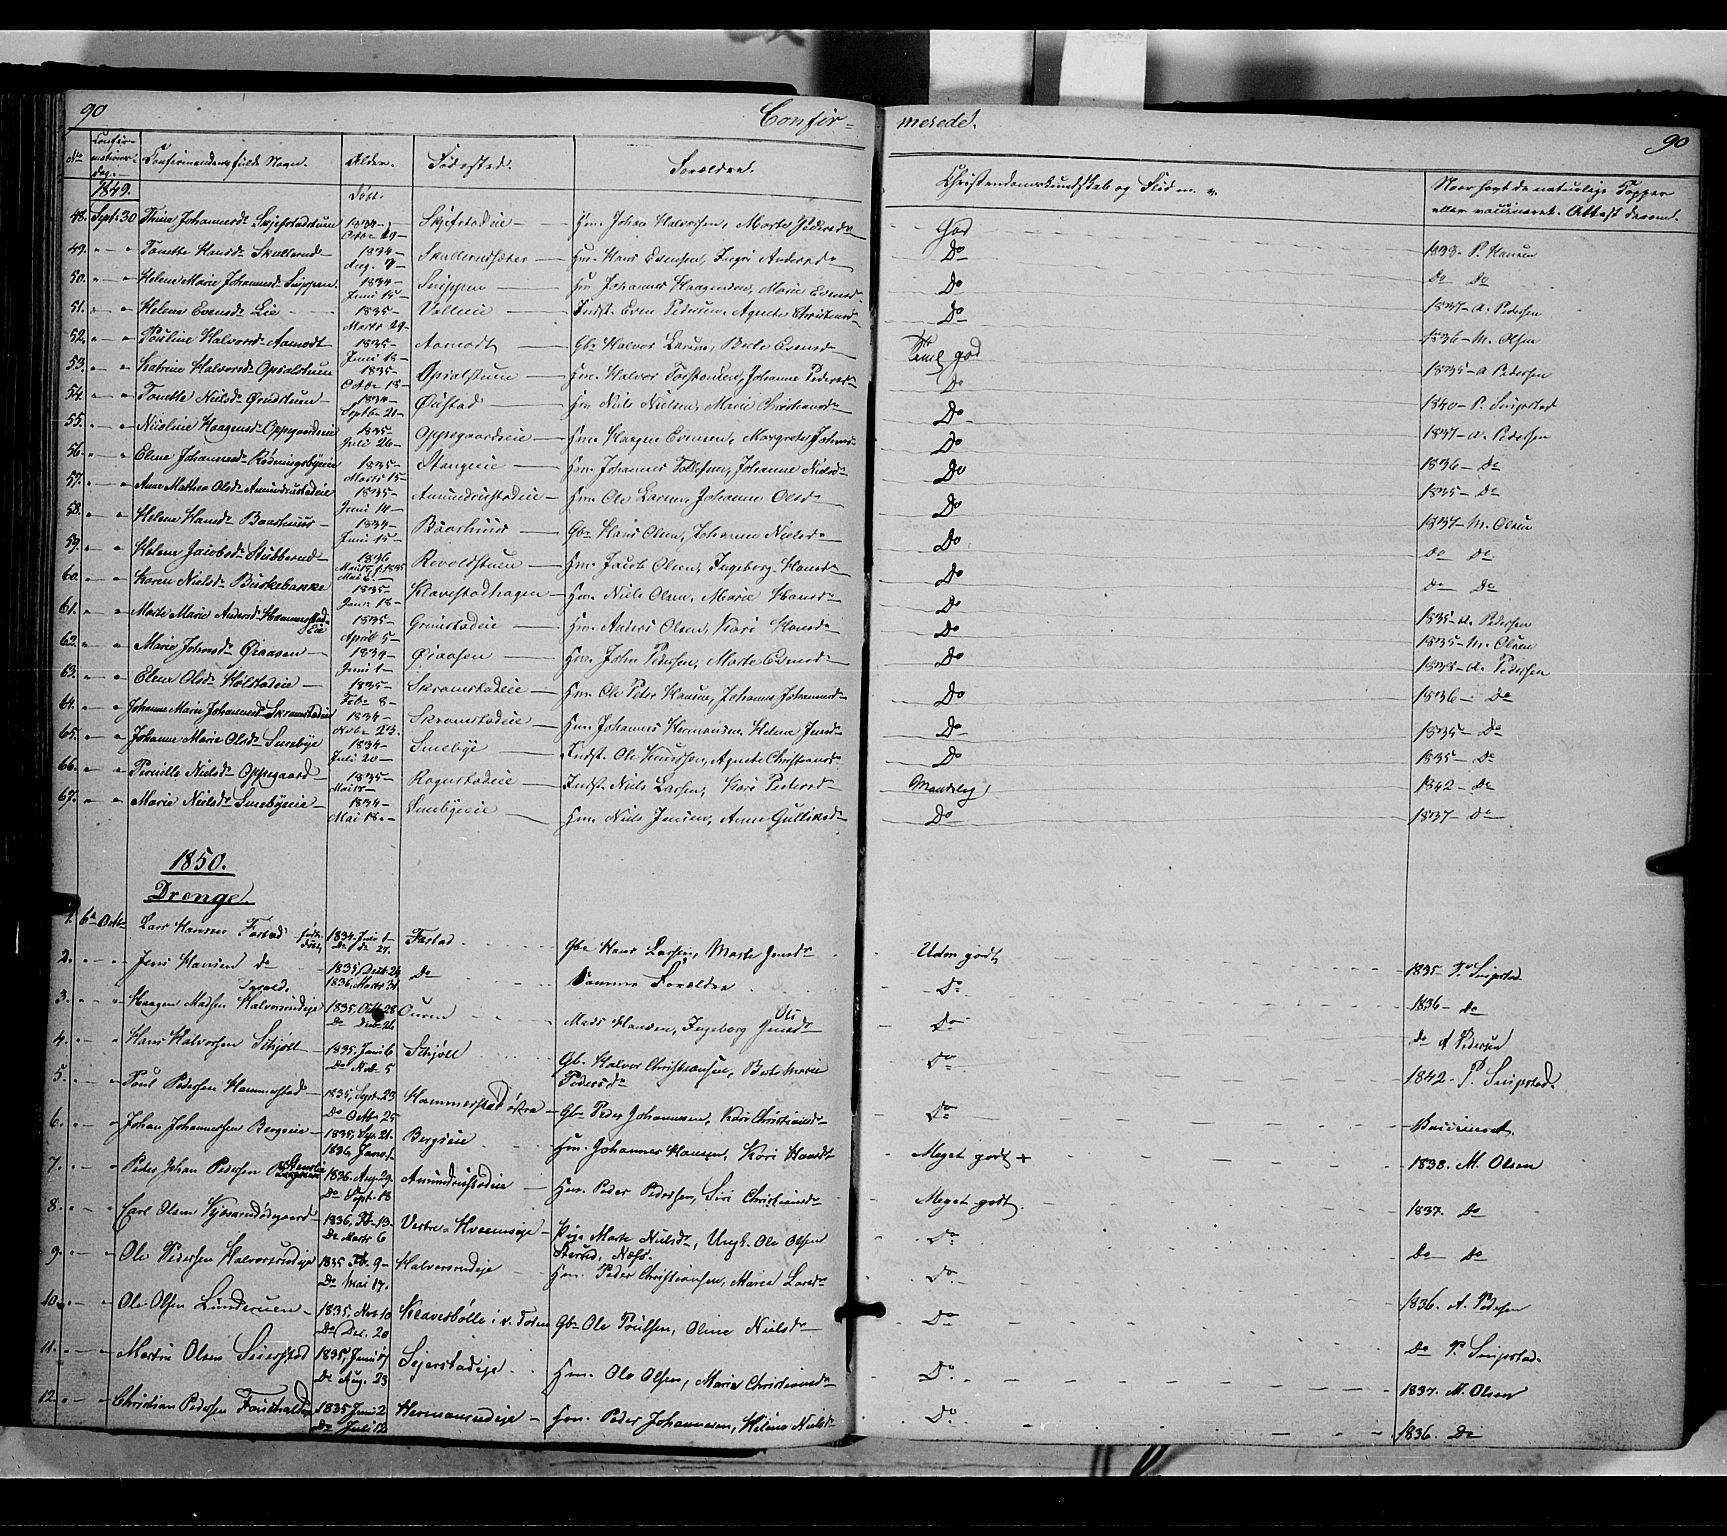 SAH, Østre Toten prestekontor, Ministerialbok nr. 3, 1848-1856, s. 90